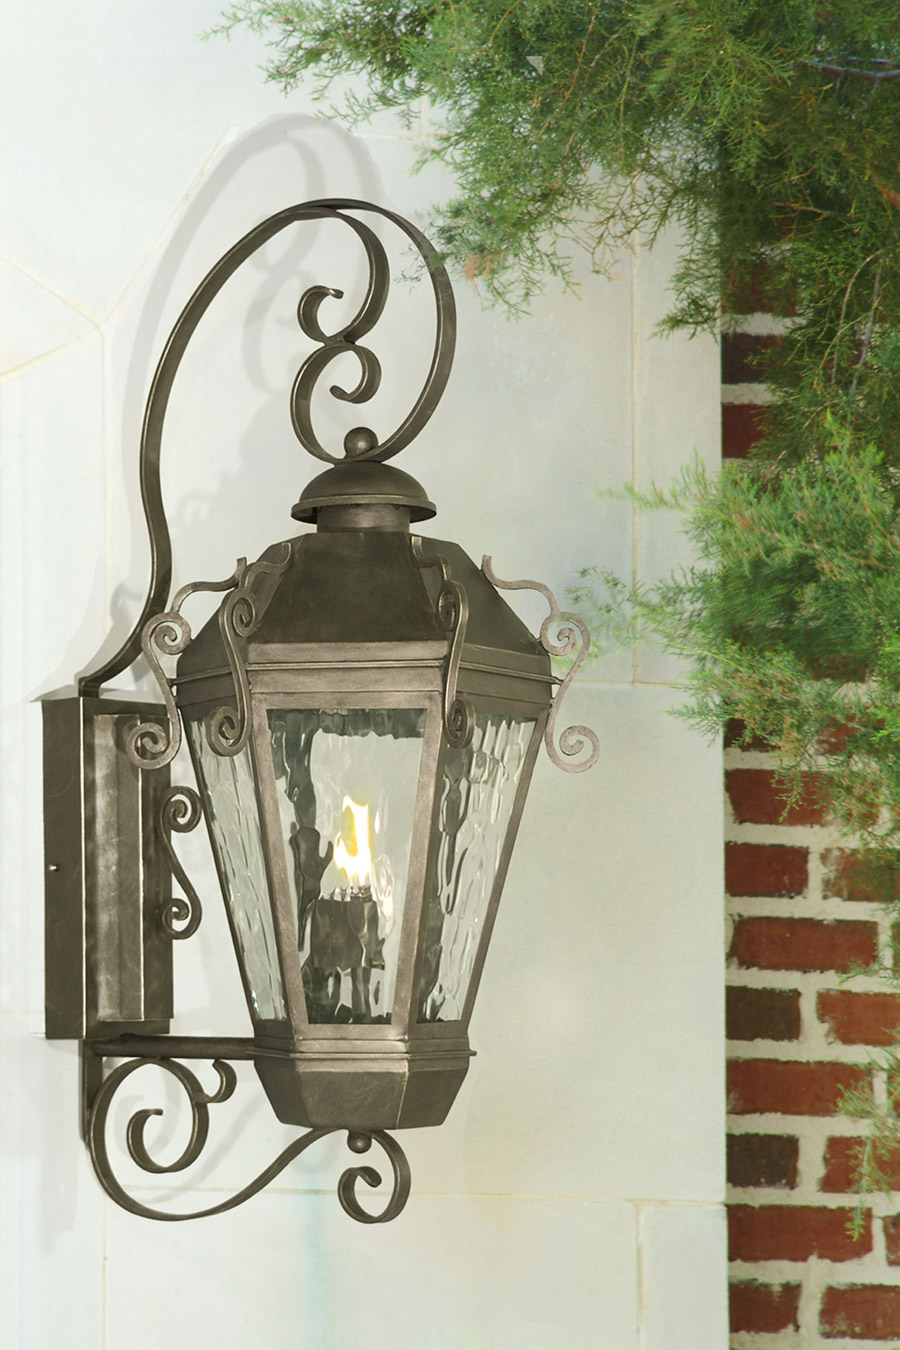 Vienna-iron-lighting-fixture-foyer-hall-pendant-entry-kitchen-solara-ligthing-D006-012-EG-(1)